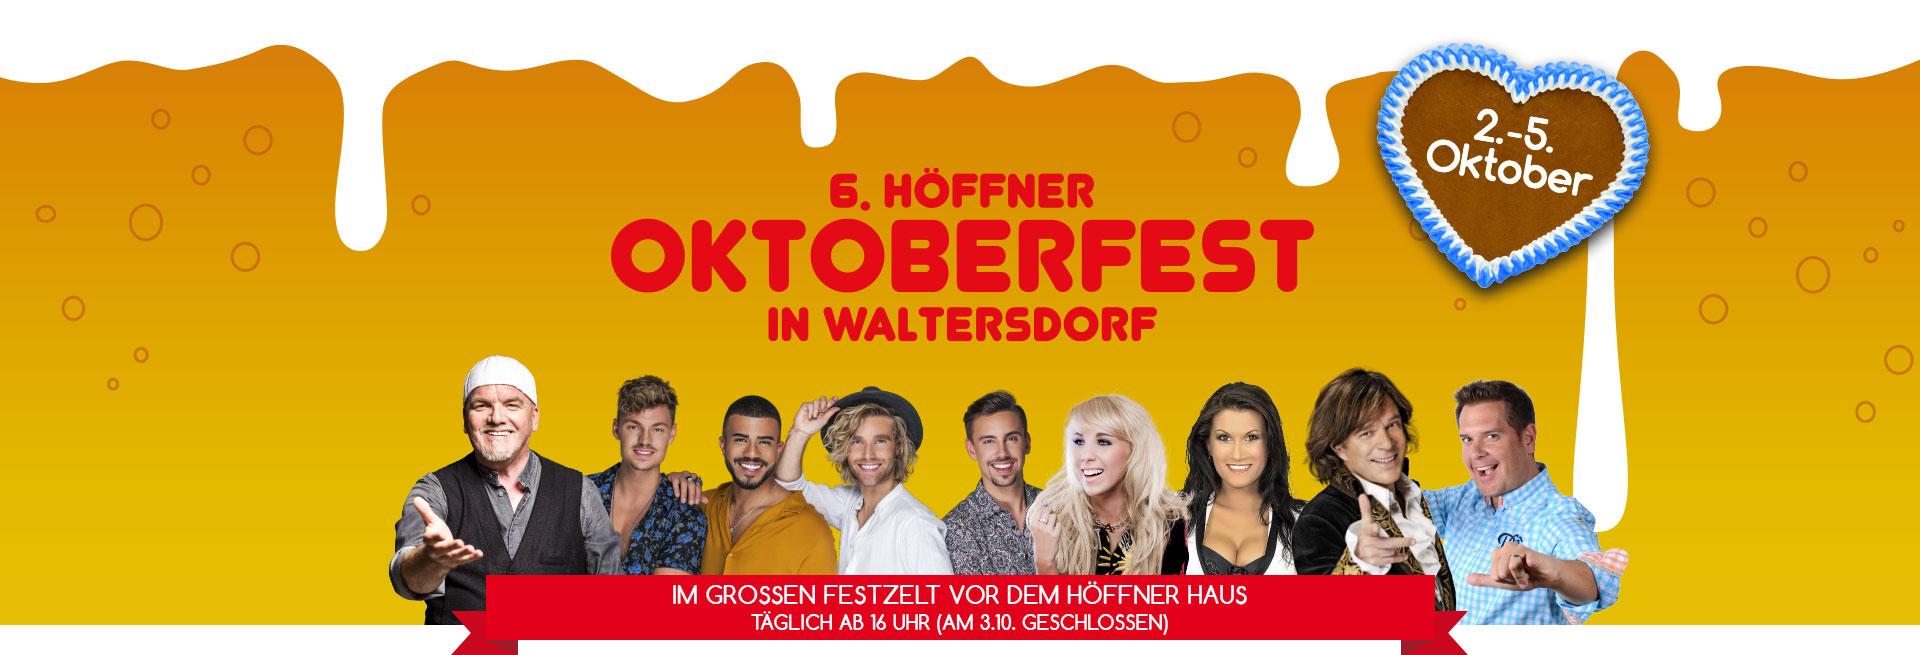 Oktoberfest Waltersdorf | Möbel Höffner